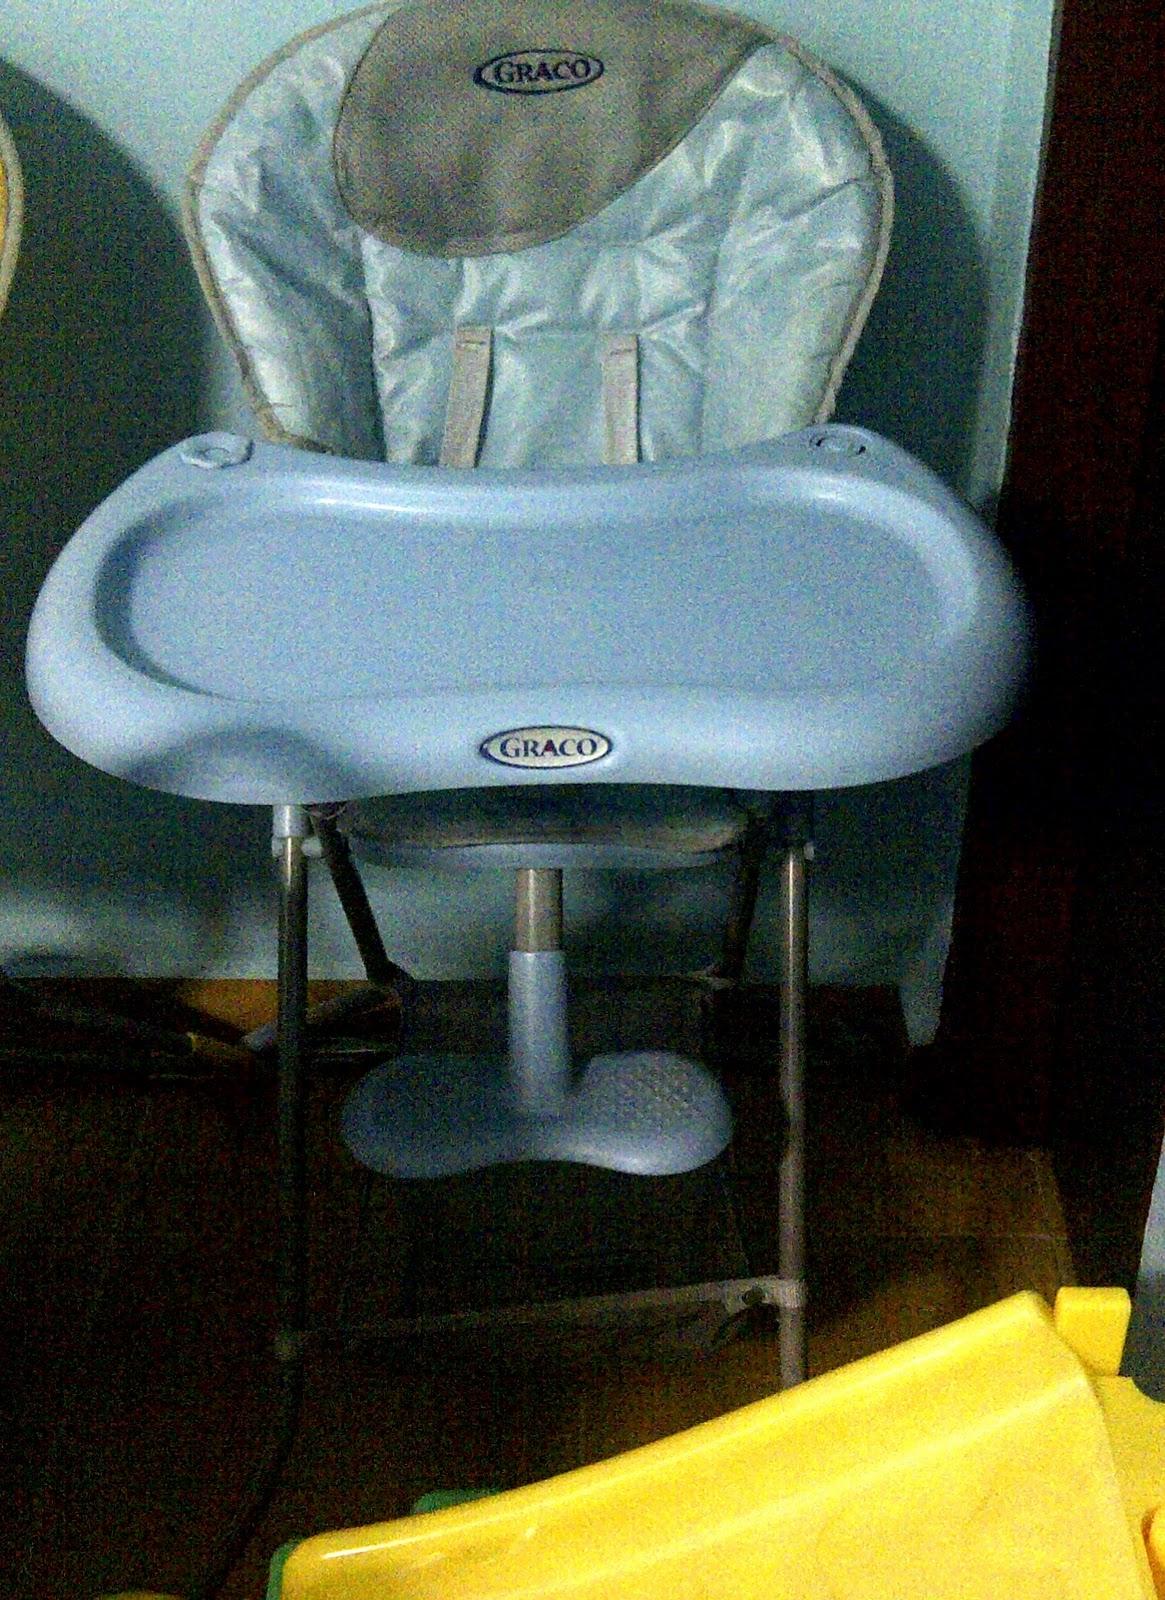 Graco High Chair Straps Instructions Eames Aluminum Management Special Toys Shop